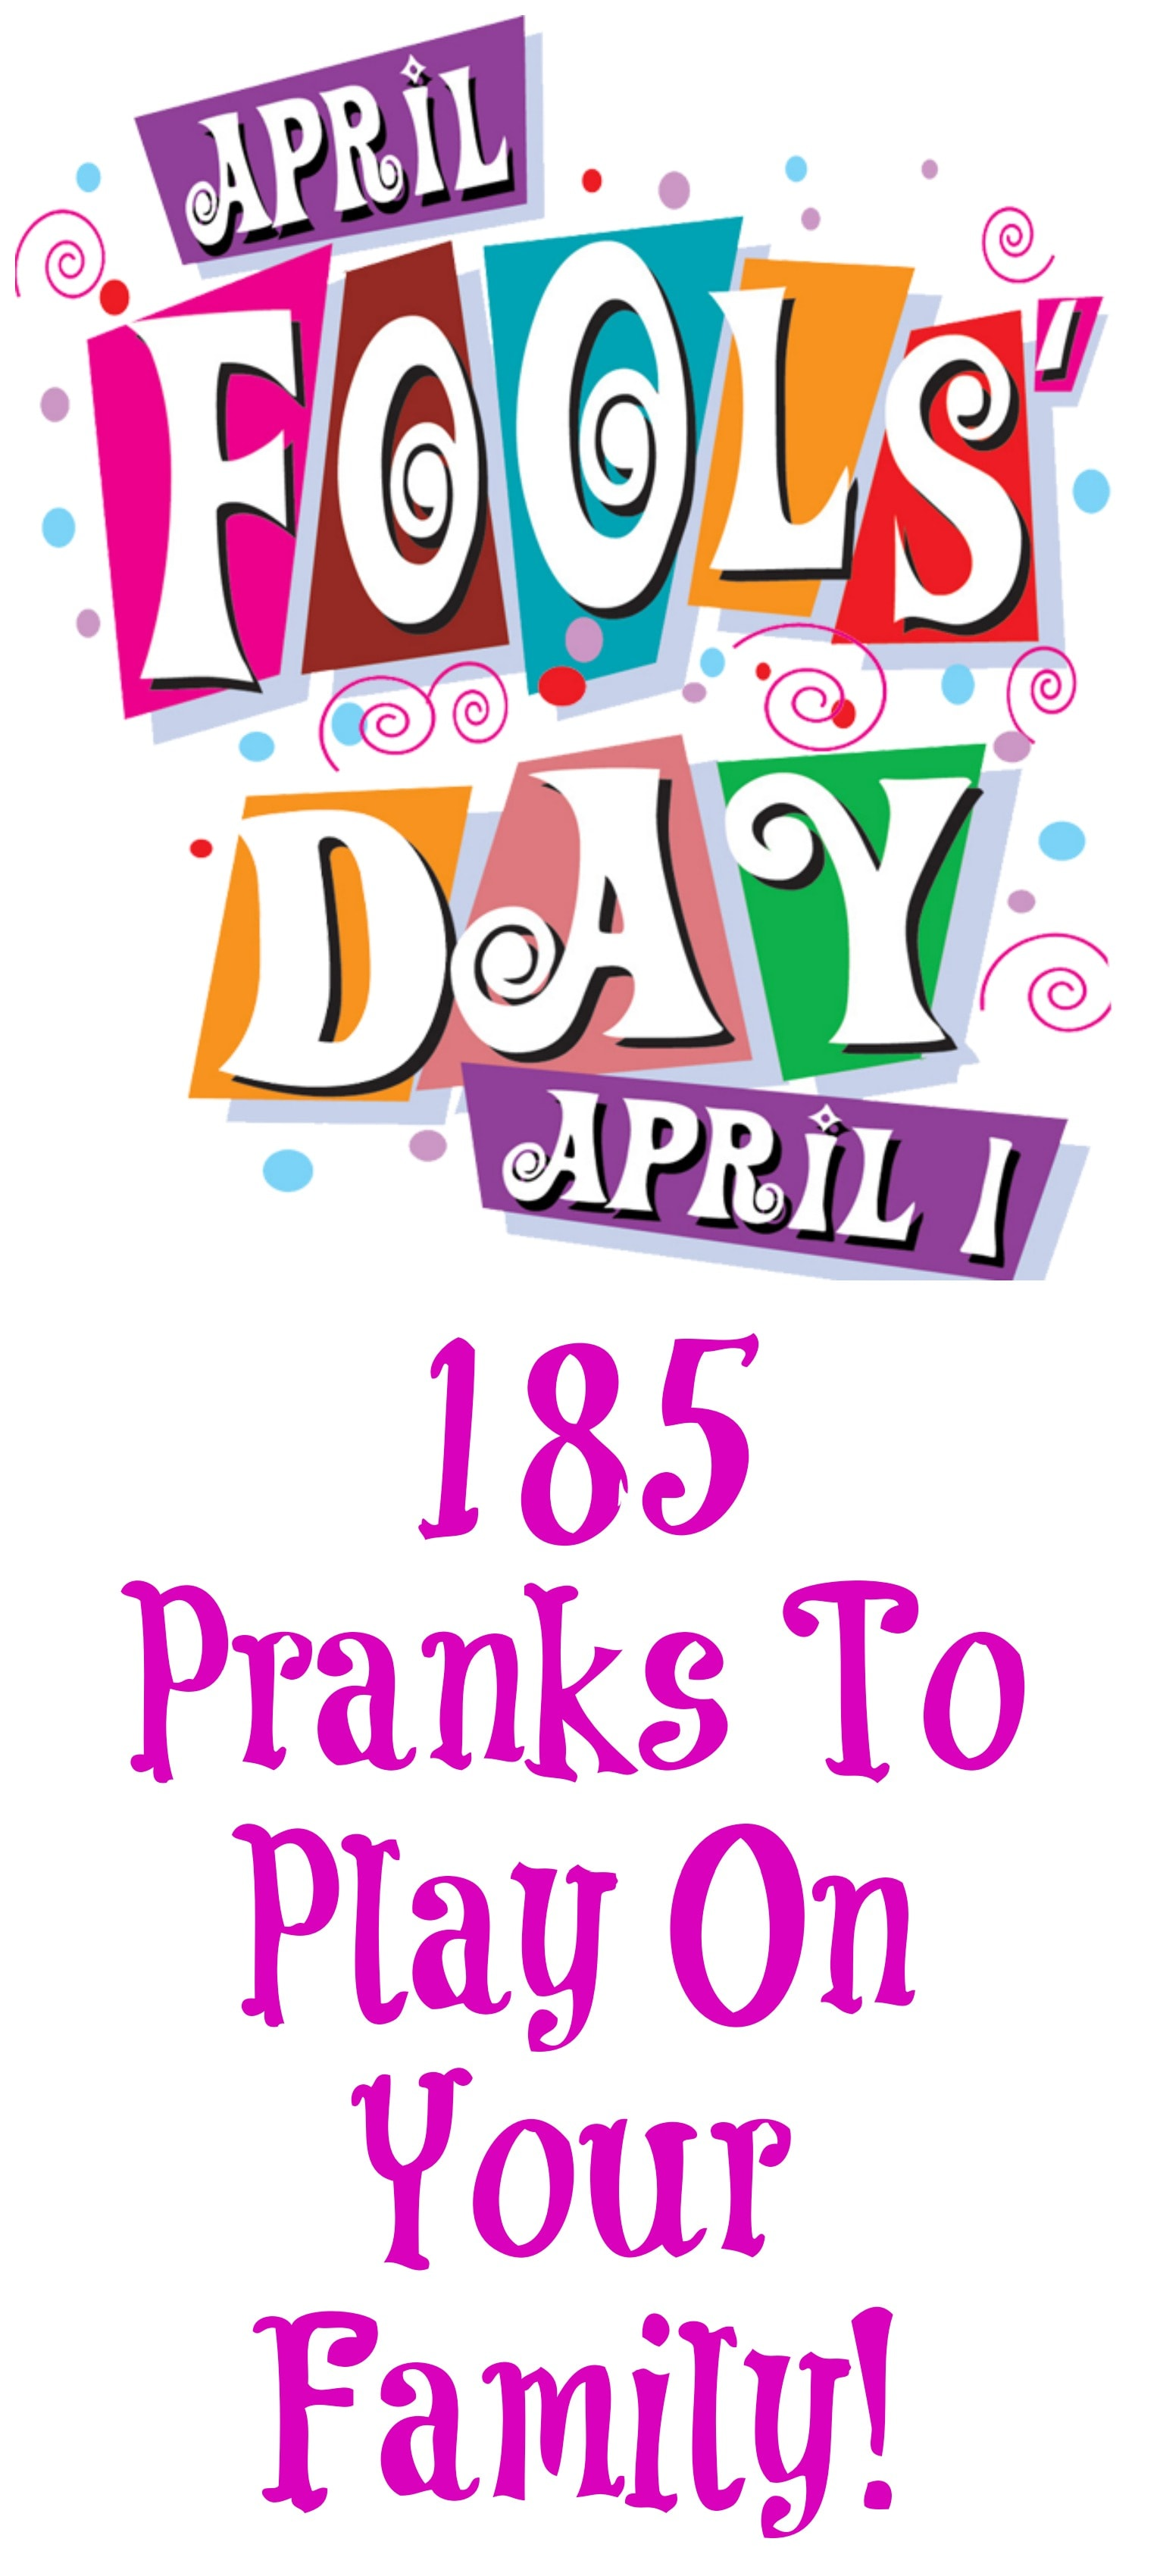 april_fools_day.jpg